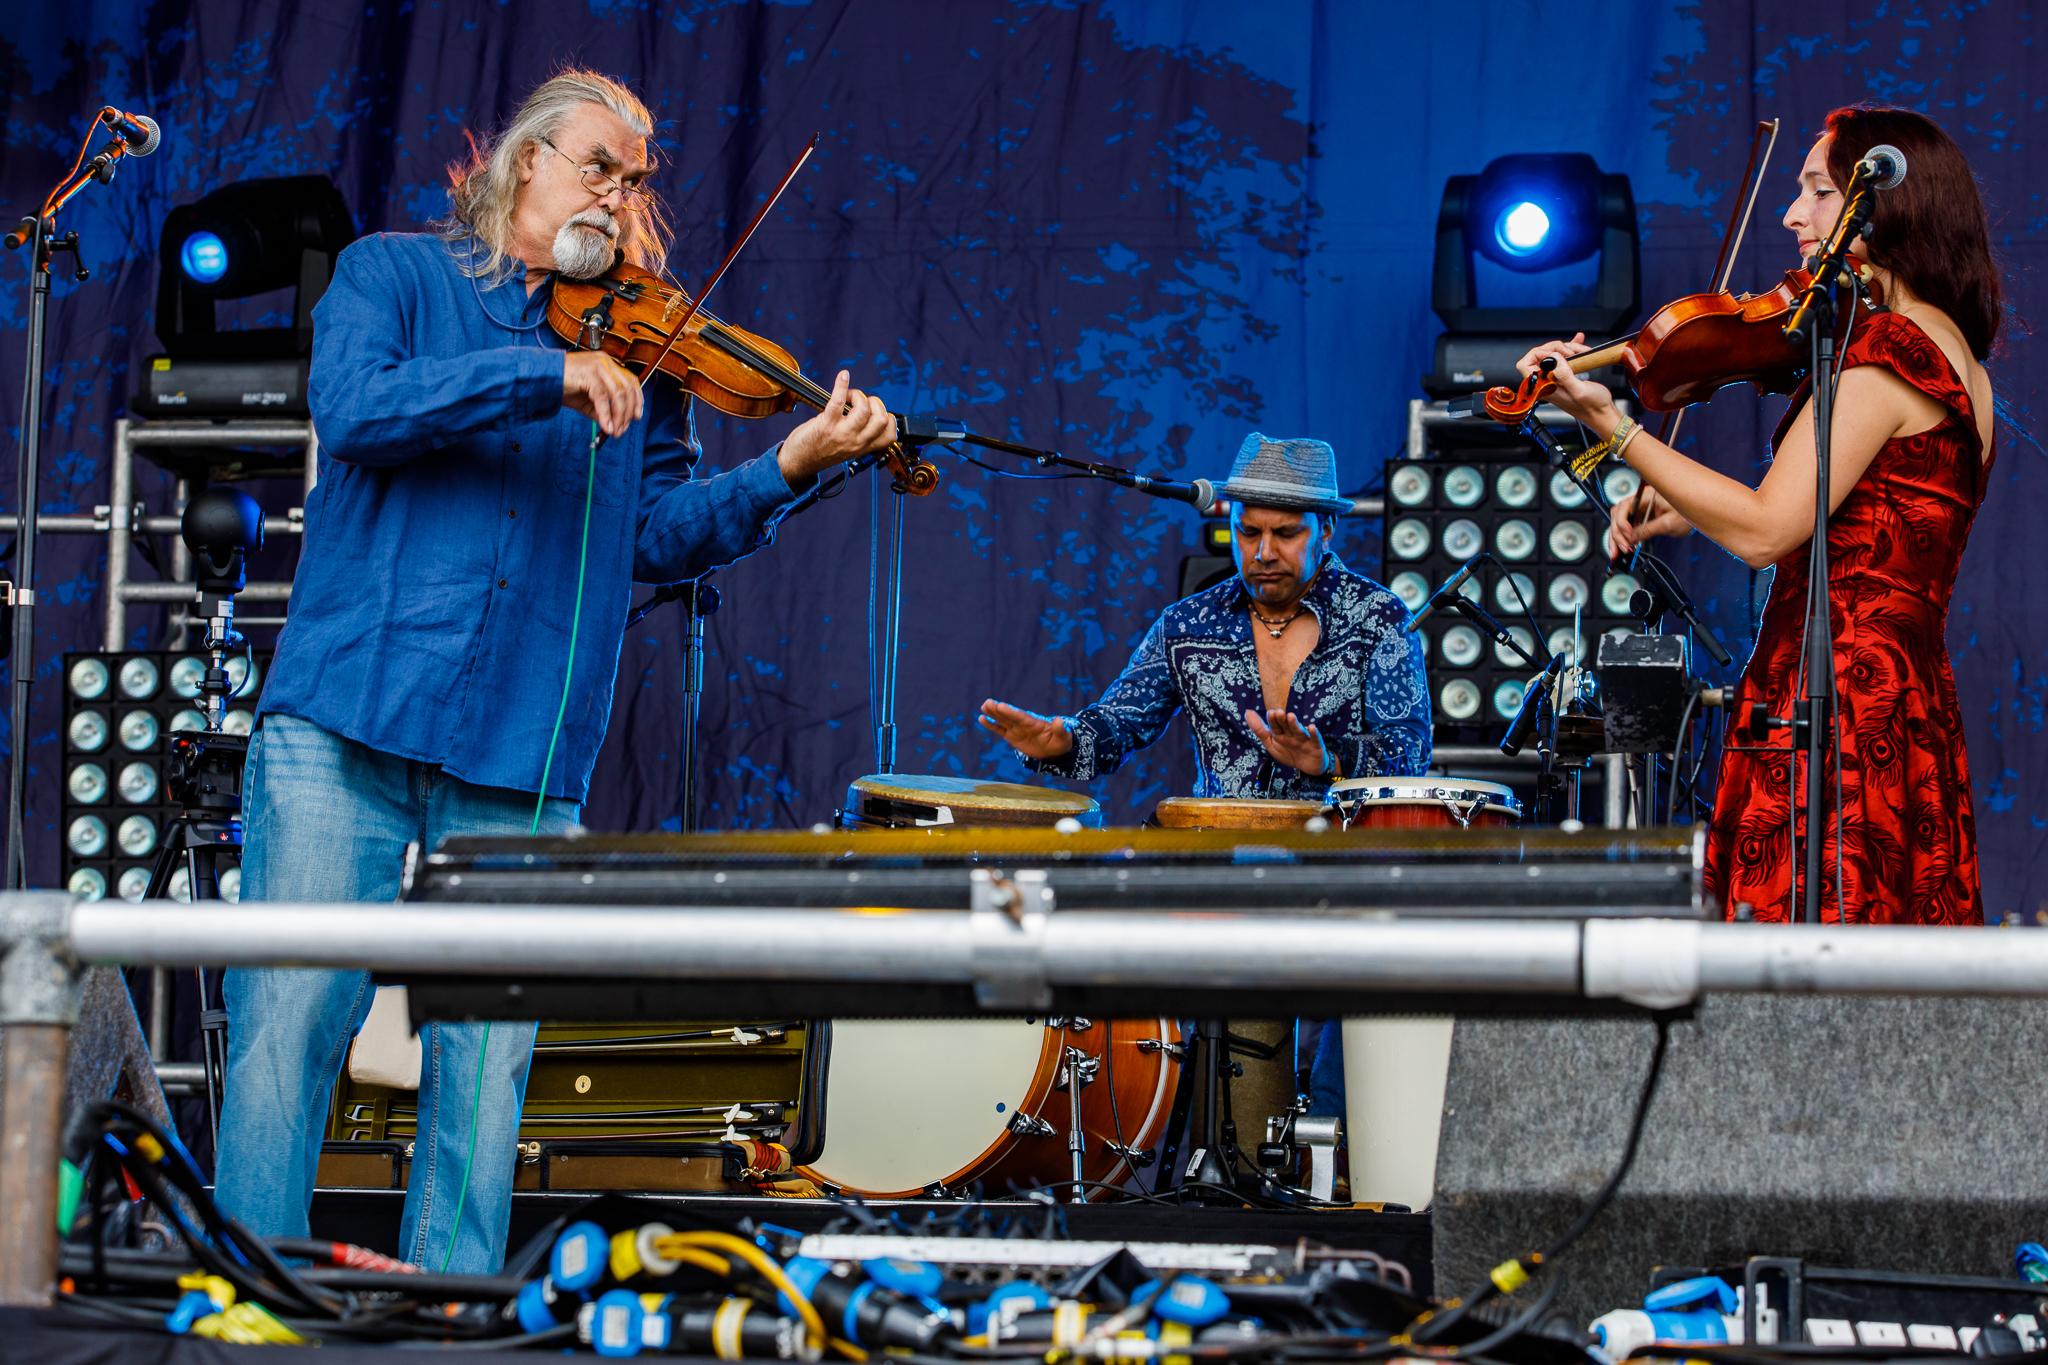 Gigspanner Big Band at Fairport's Cropredy Convention (photo by Matt Condon / @arcane93)